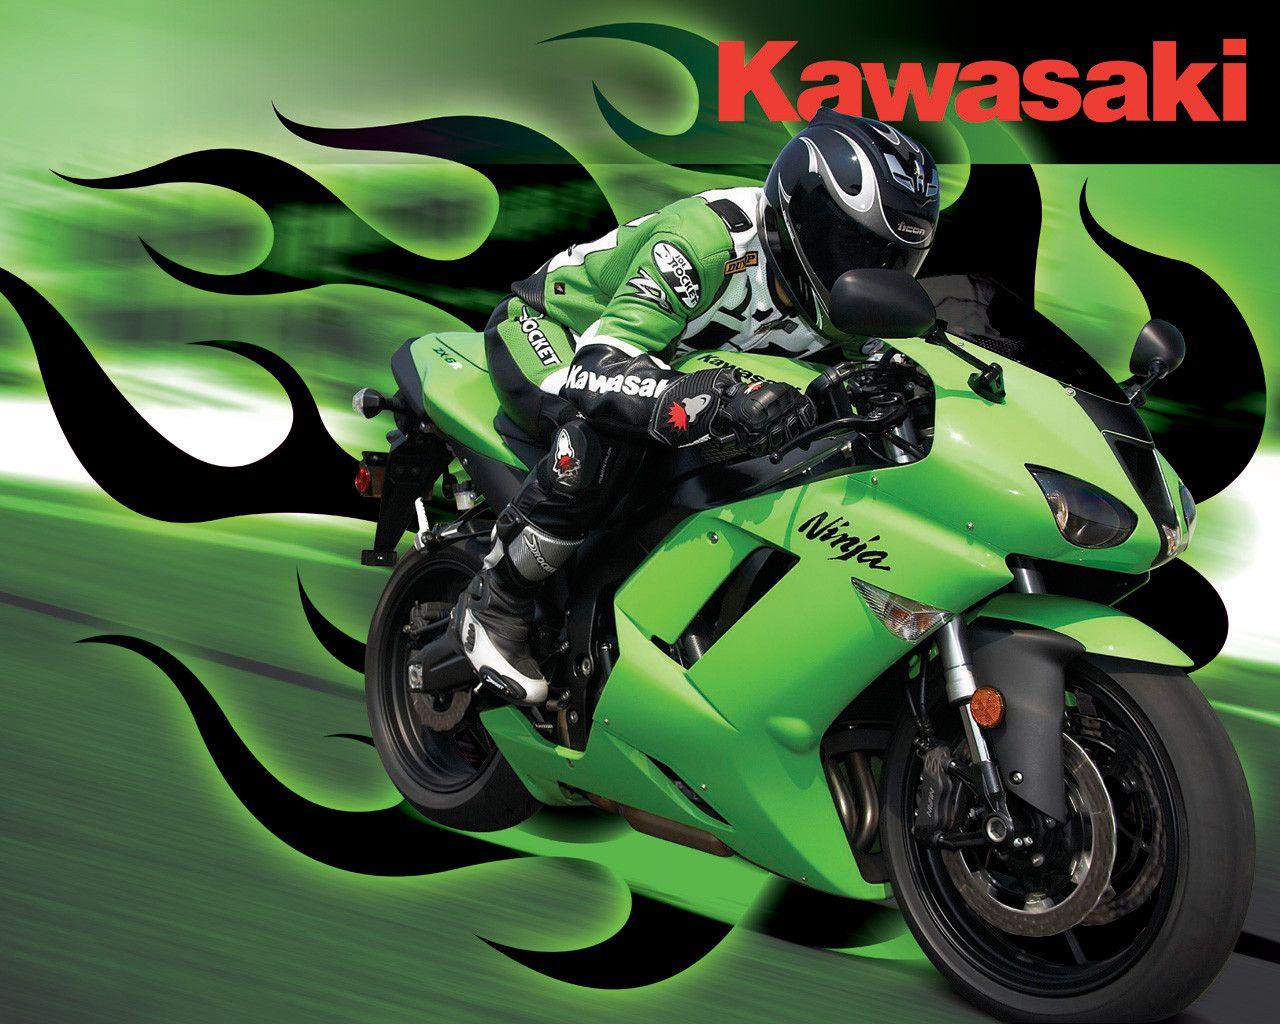 1mviept | kawasaki ninja zx-10r wallpapers | pinterest | kawasaki